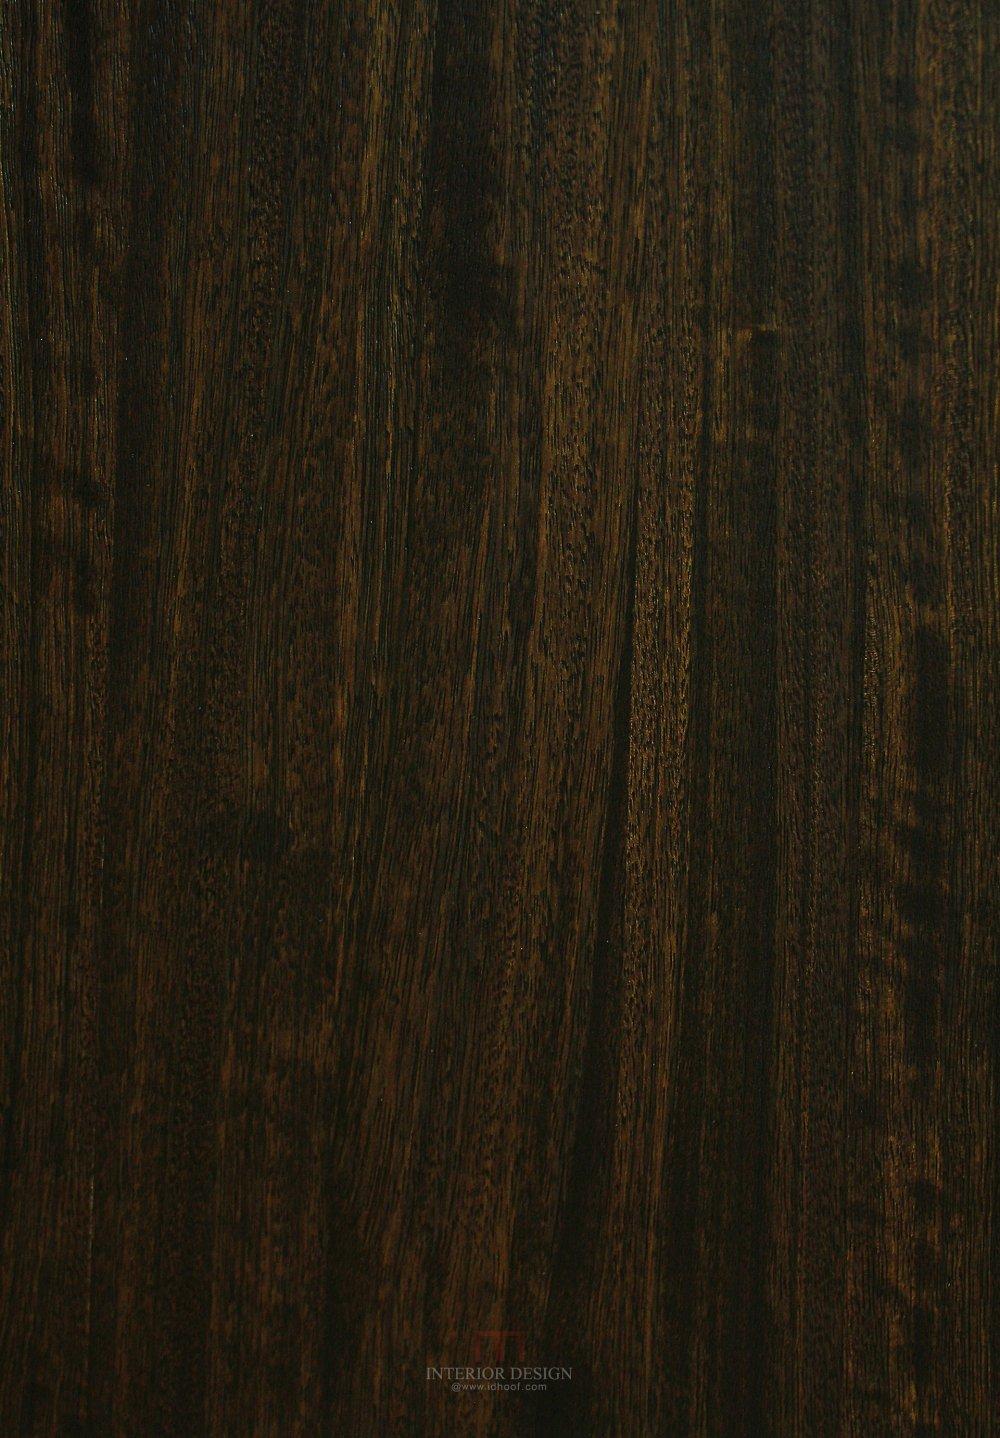 K6193DN_瑞士檀木噴砂自然拼.jpg